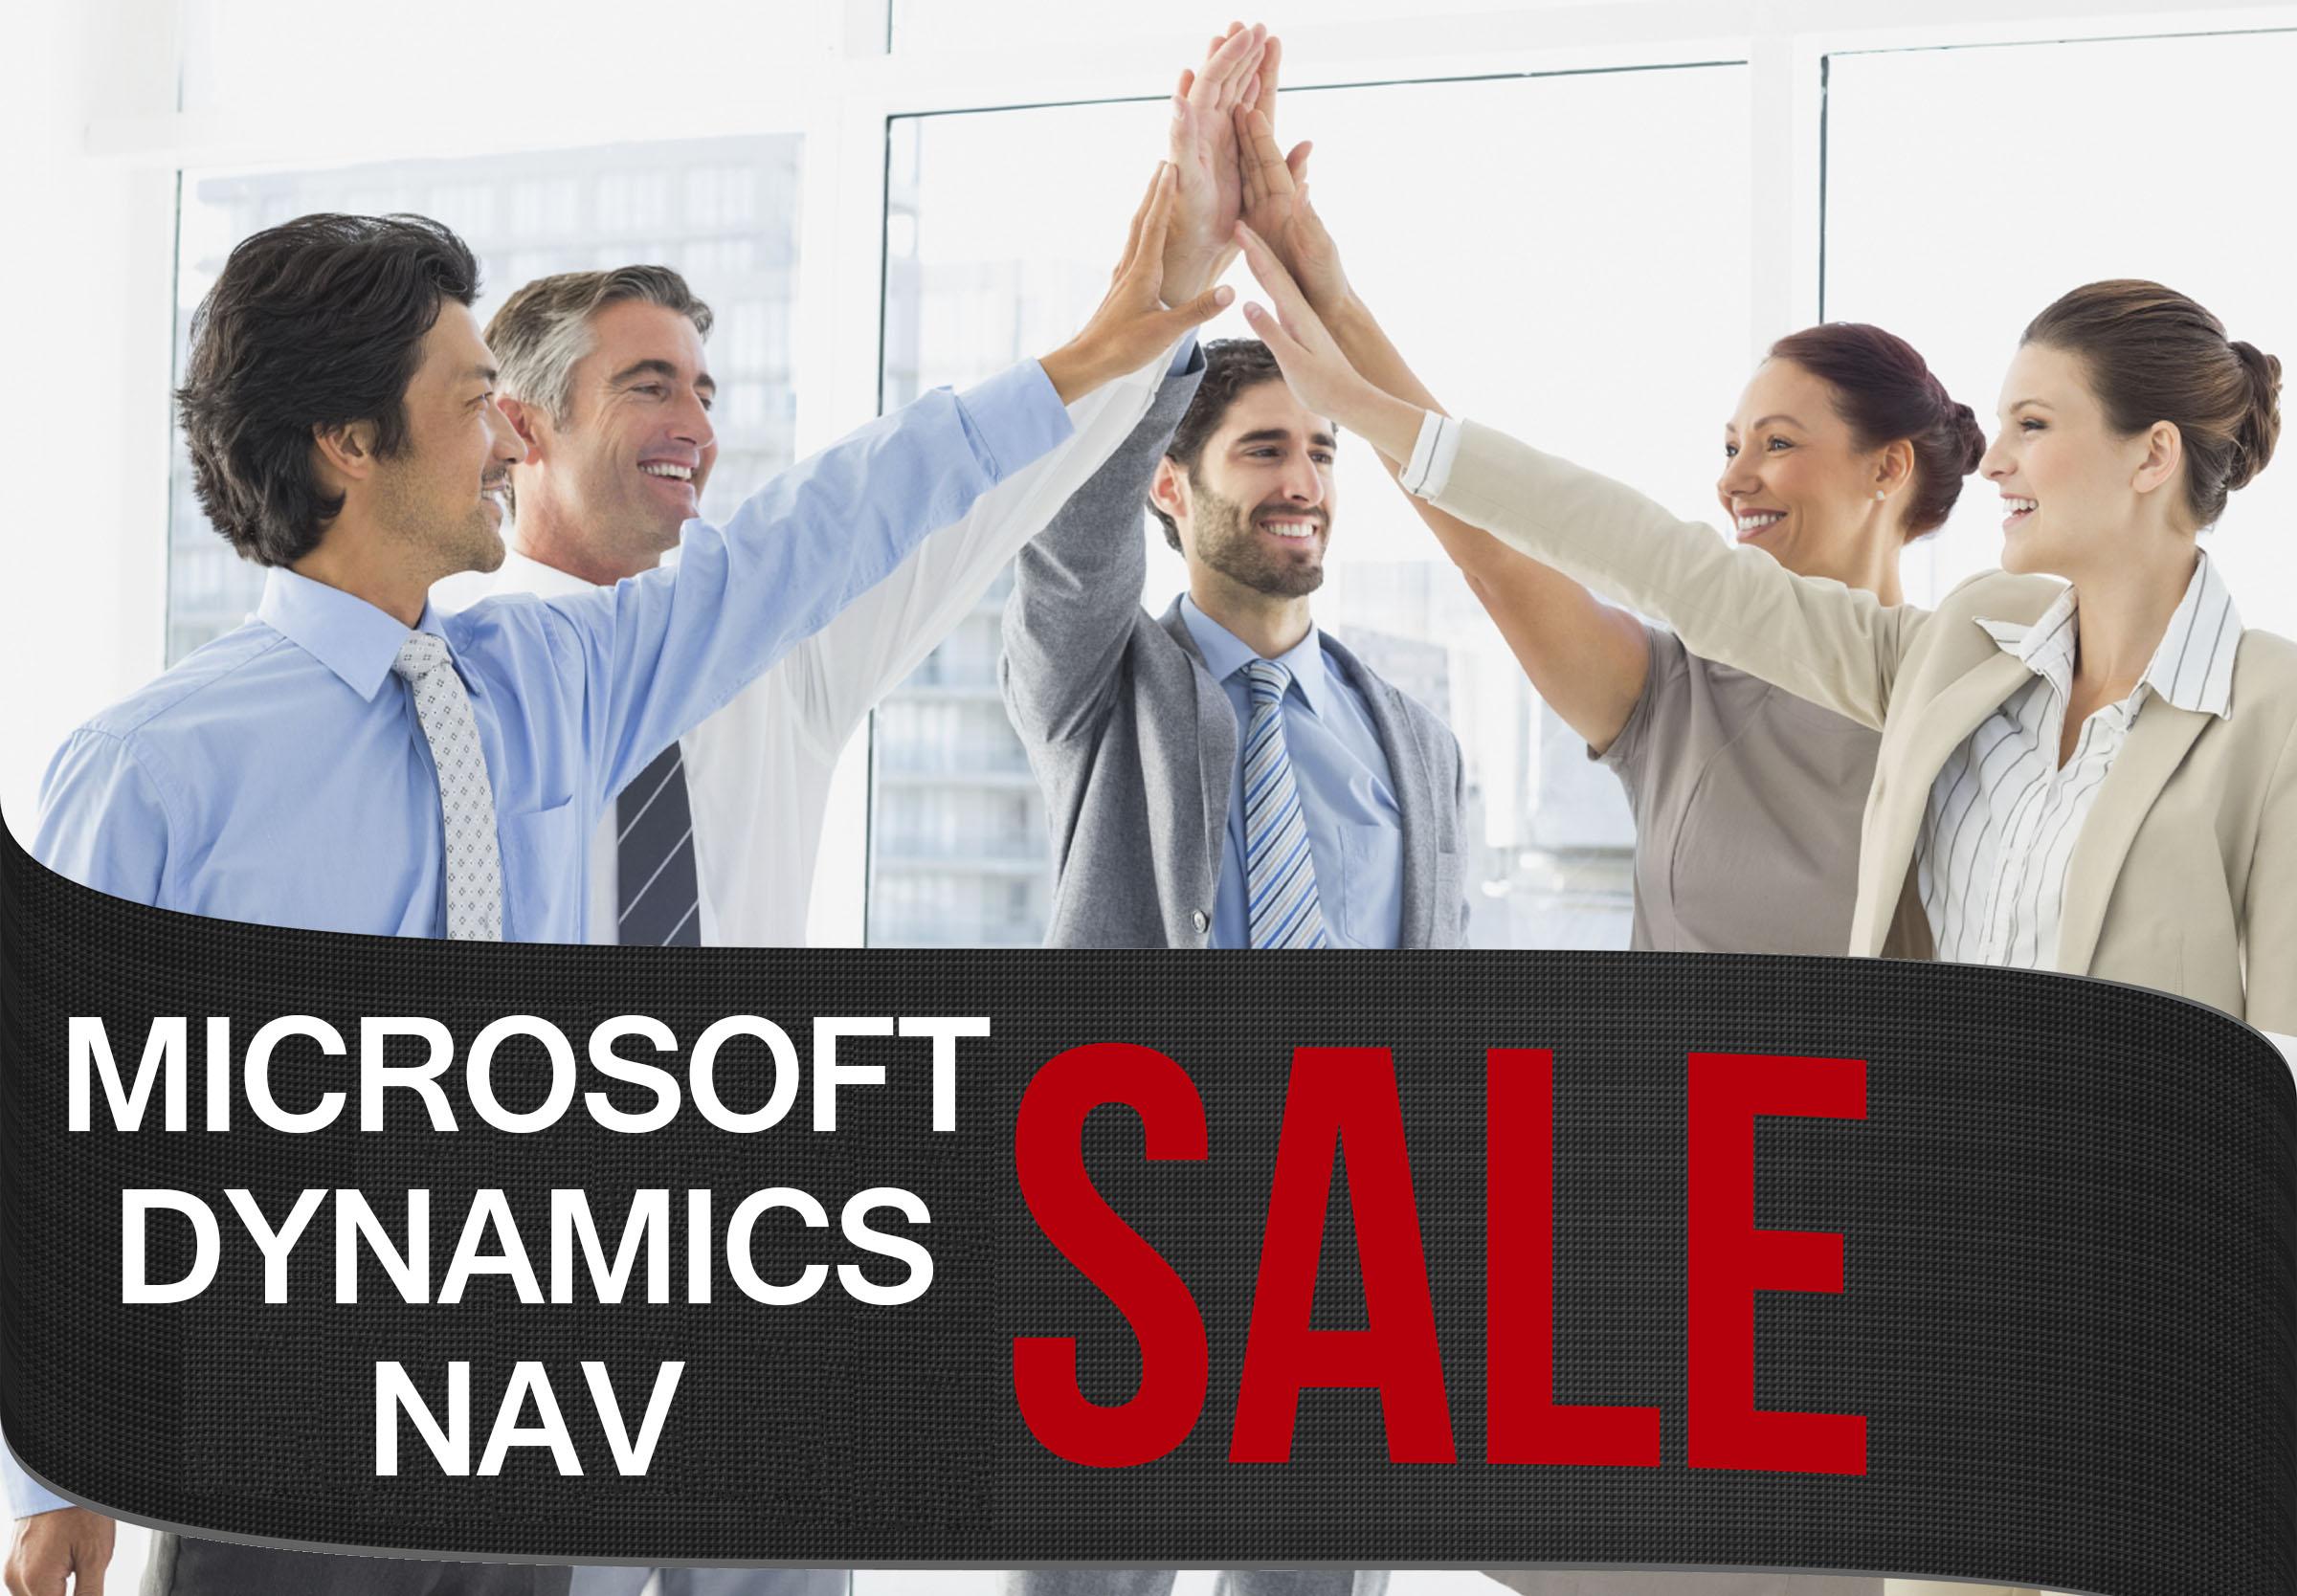 Business people celebrating Dynamics NAV is on sale